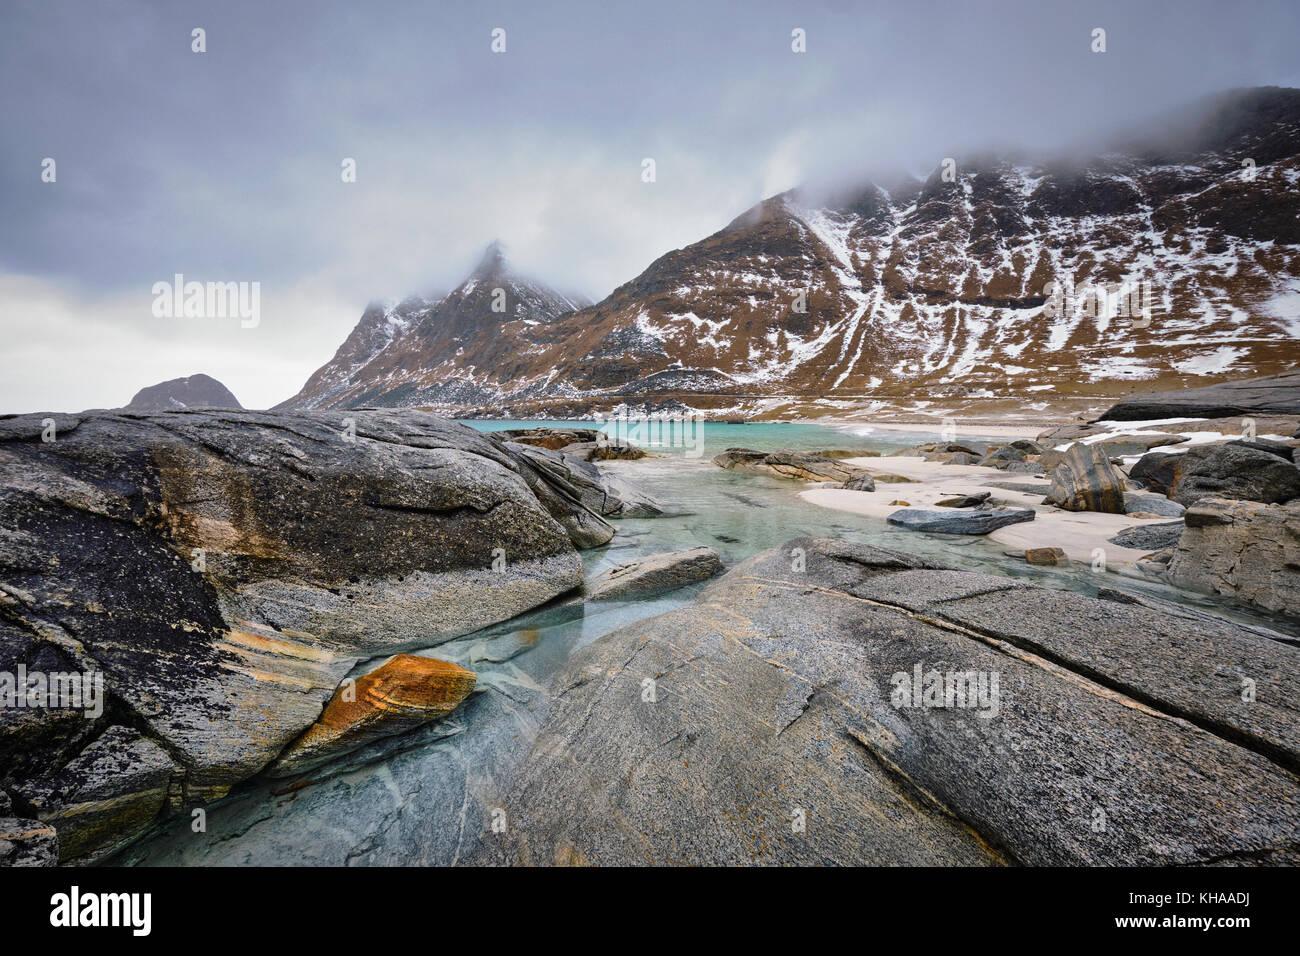 Felsige Küste von Fjord in Norwegen Stockfoto